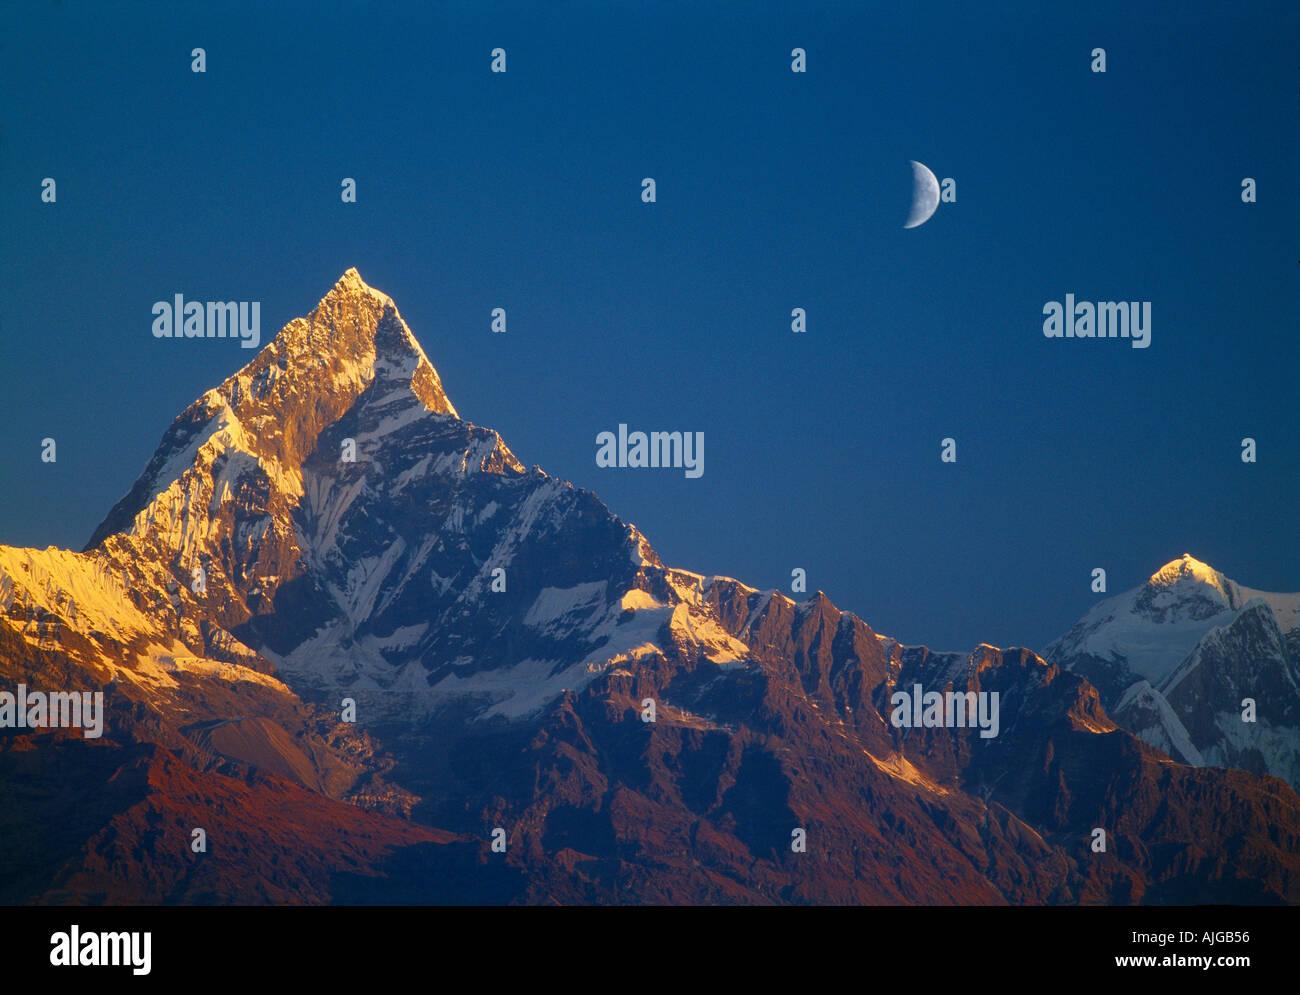 Coda di pesce Machhapuchhare montagna sacra con la luna Annapurna Himalaya Nepal Immagini Stock